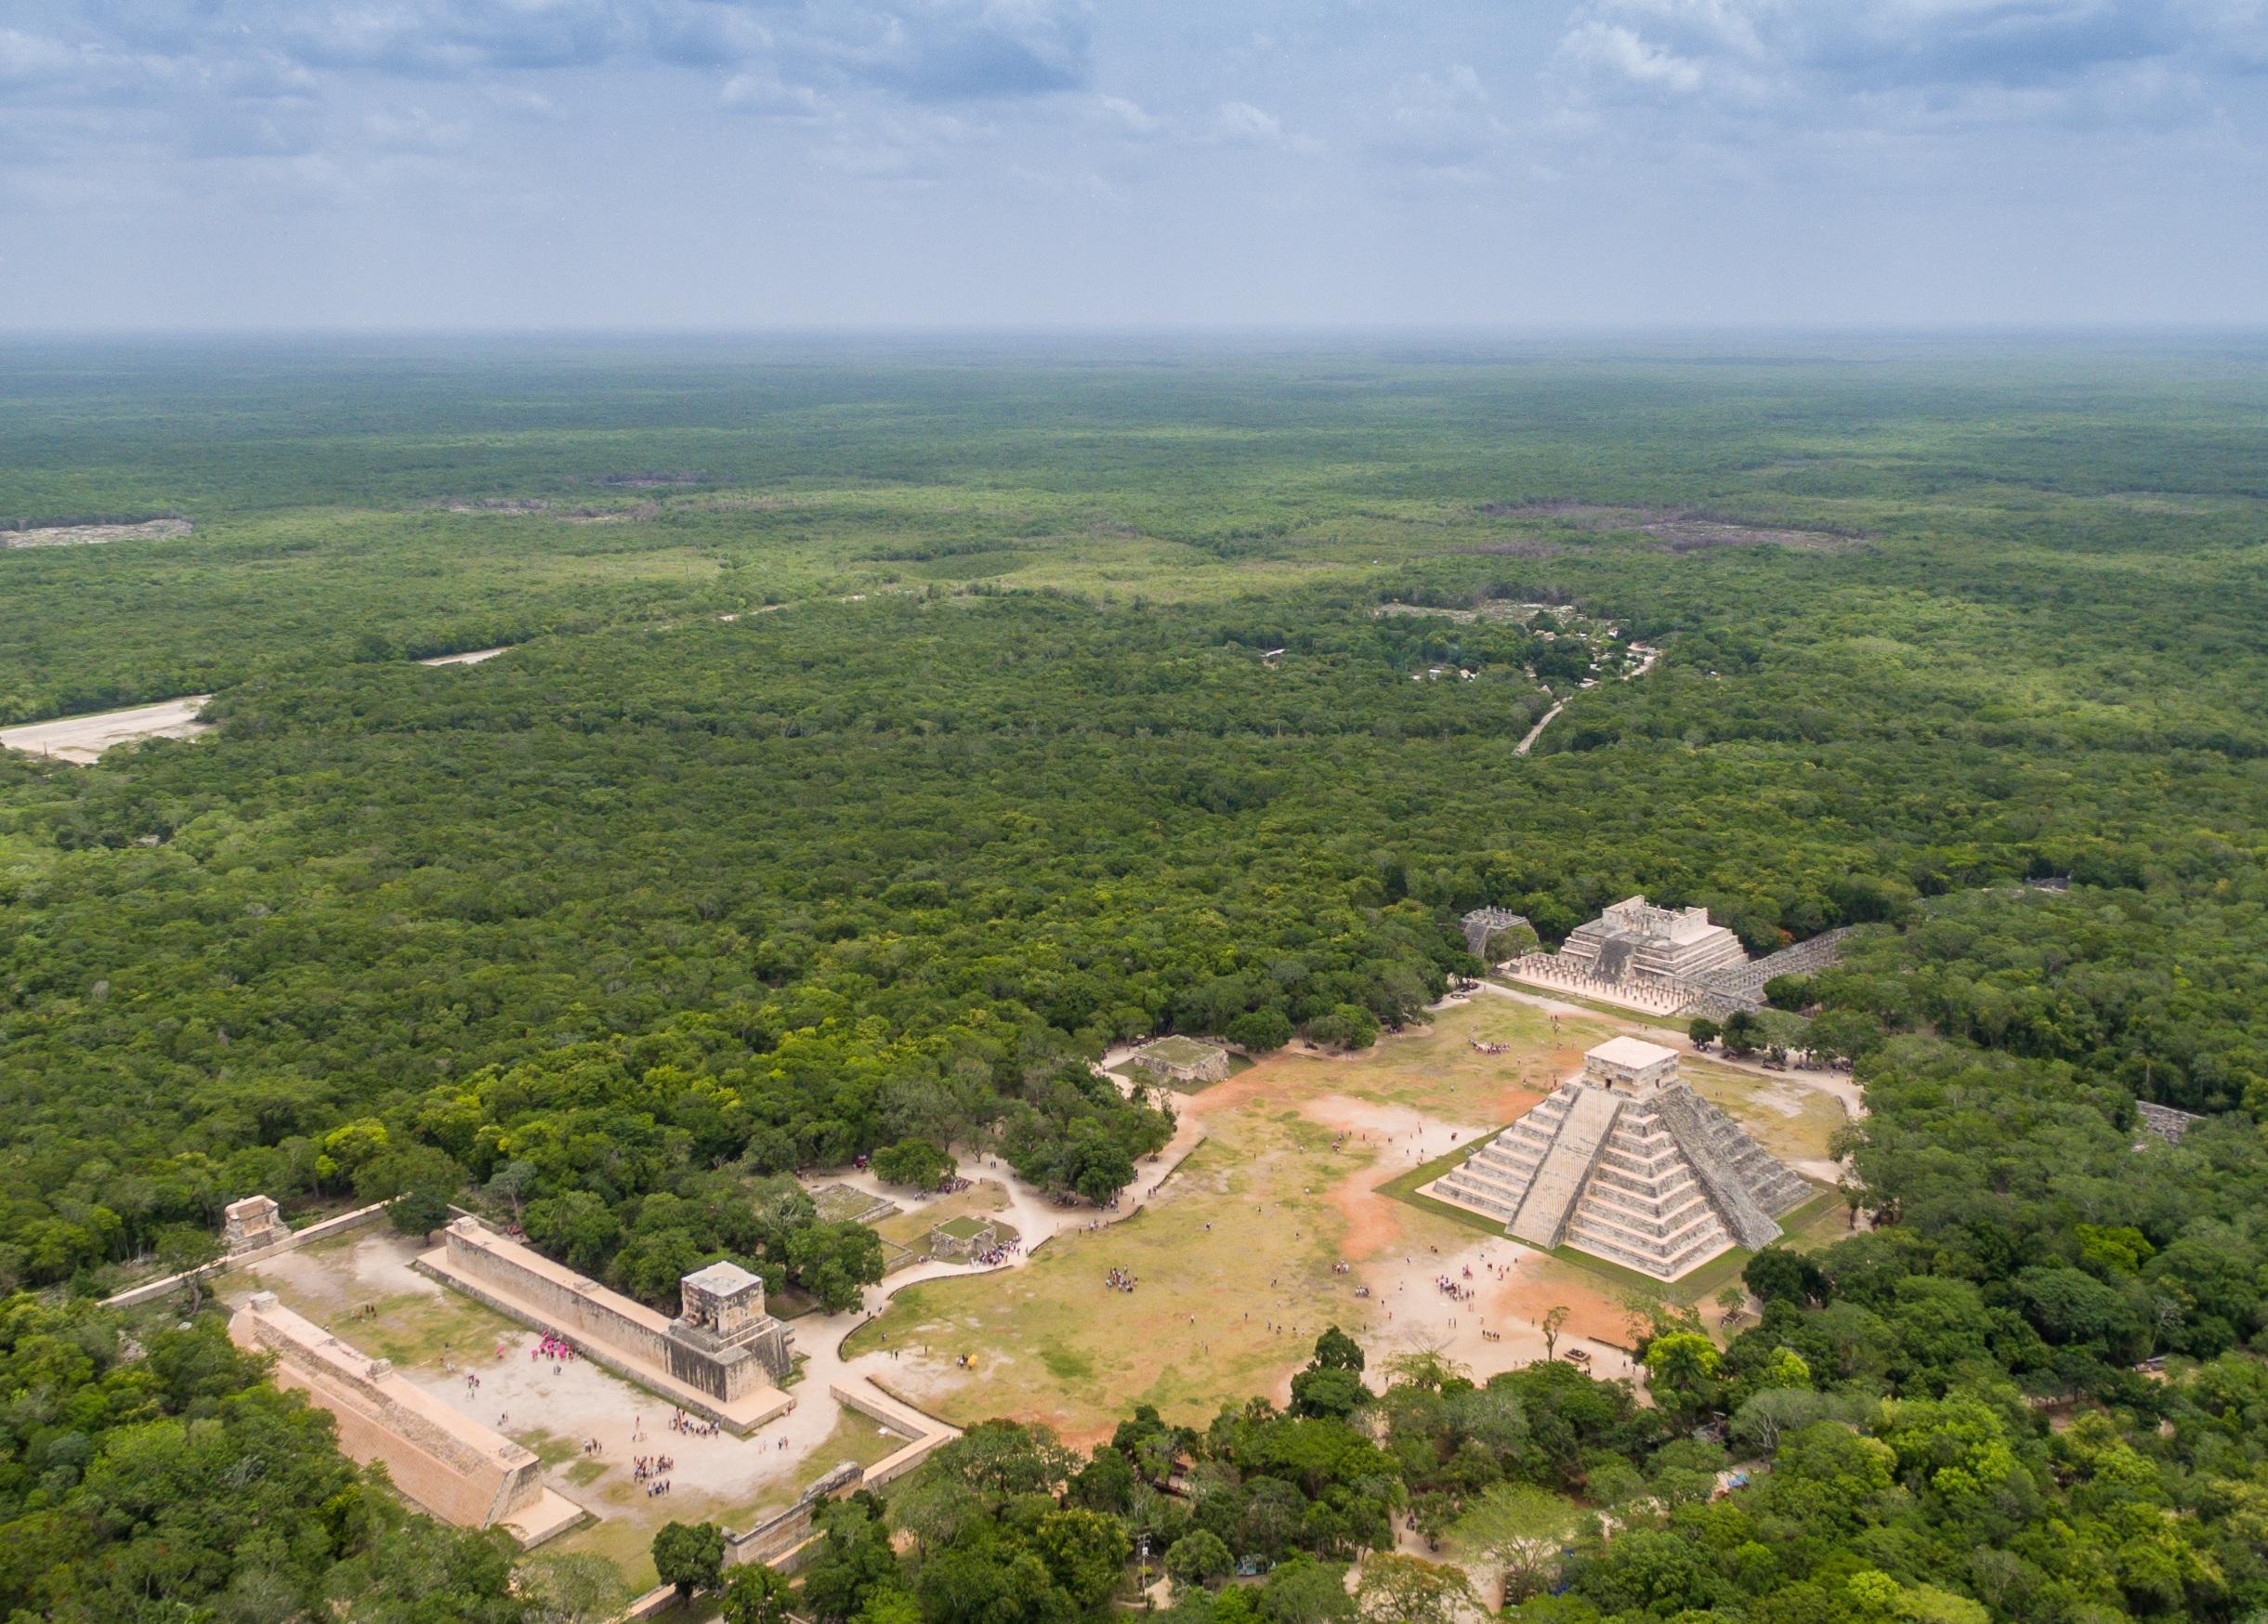 Chichén Itzá – Wikipédia, a enciclopédia livre